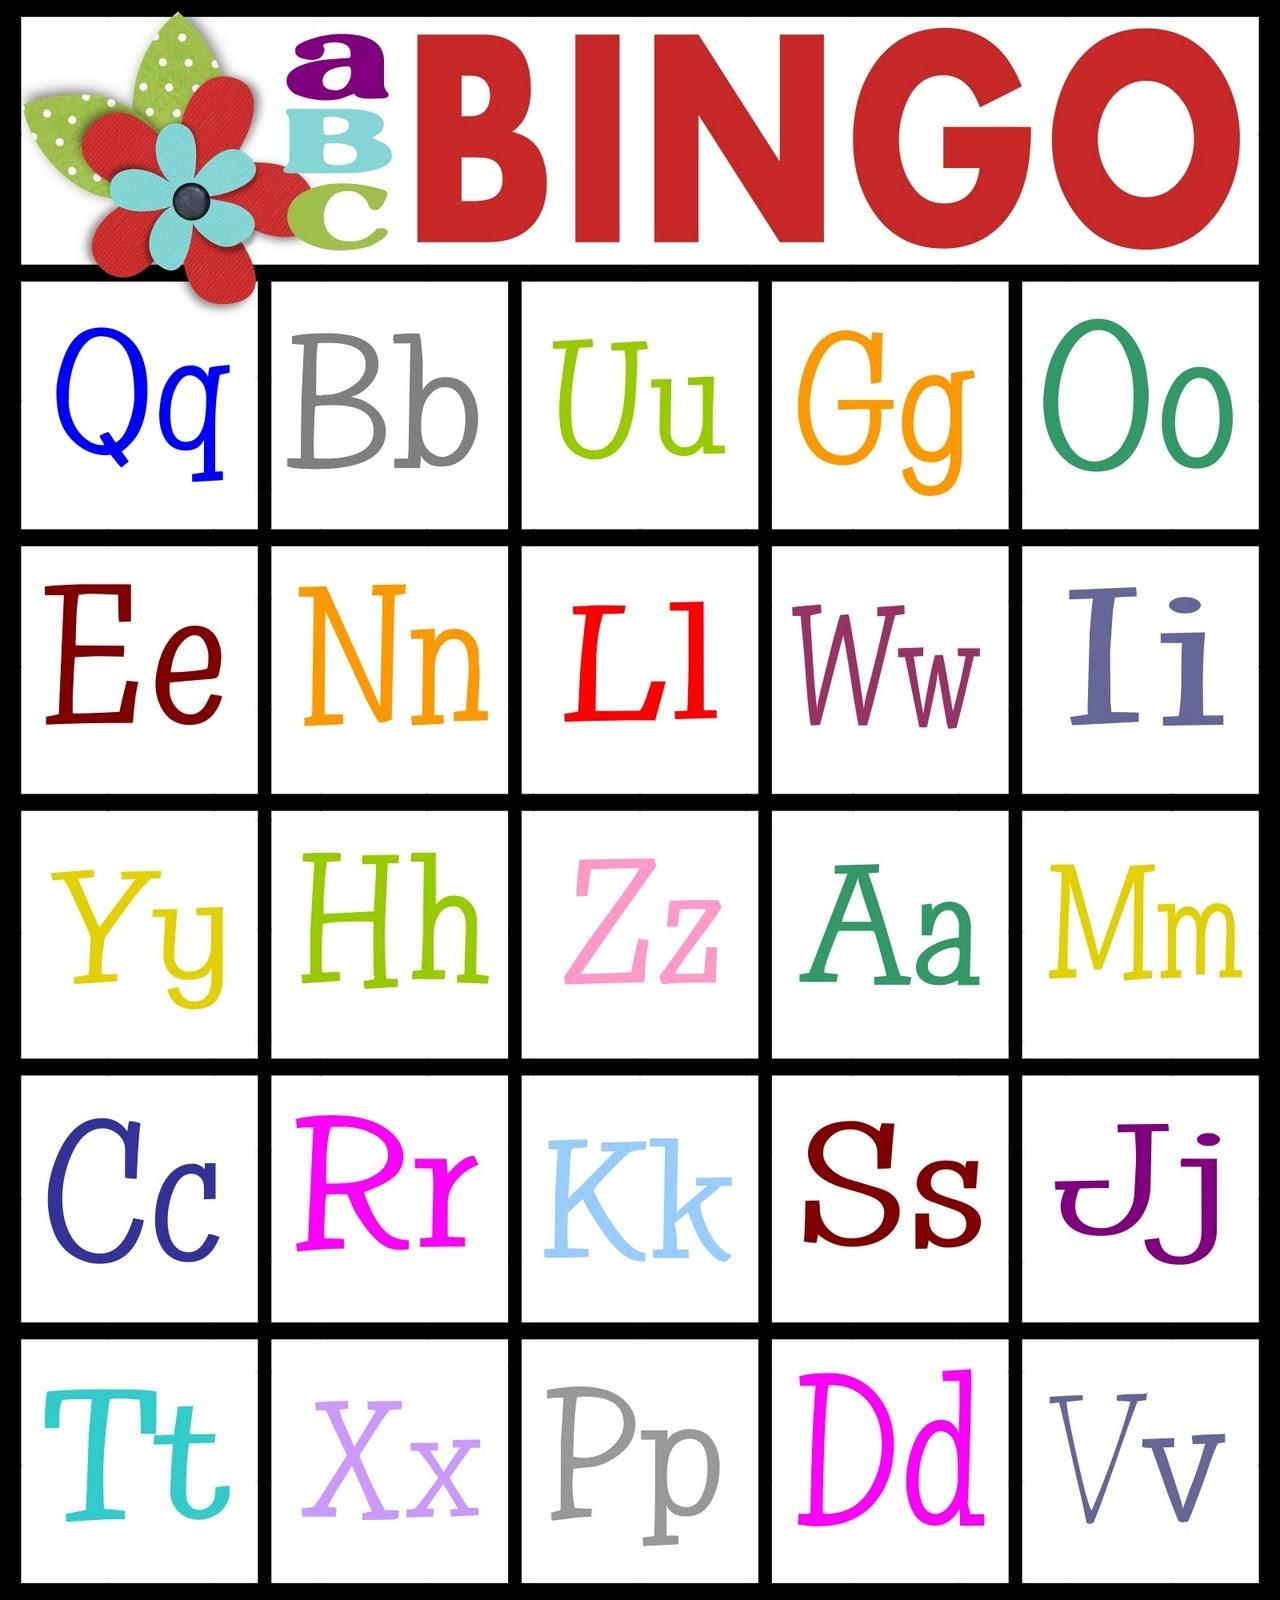 Abc's Bingo- Free Printable! - Sassy Sanctuary - Free Printable Alphabet Bingo Cards